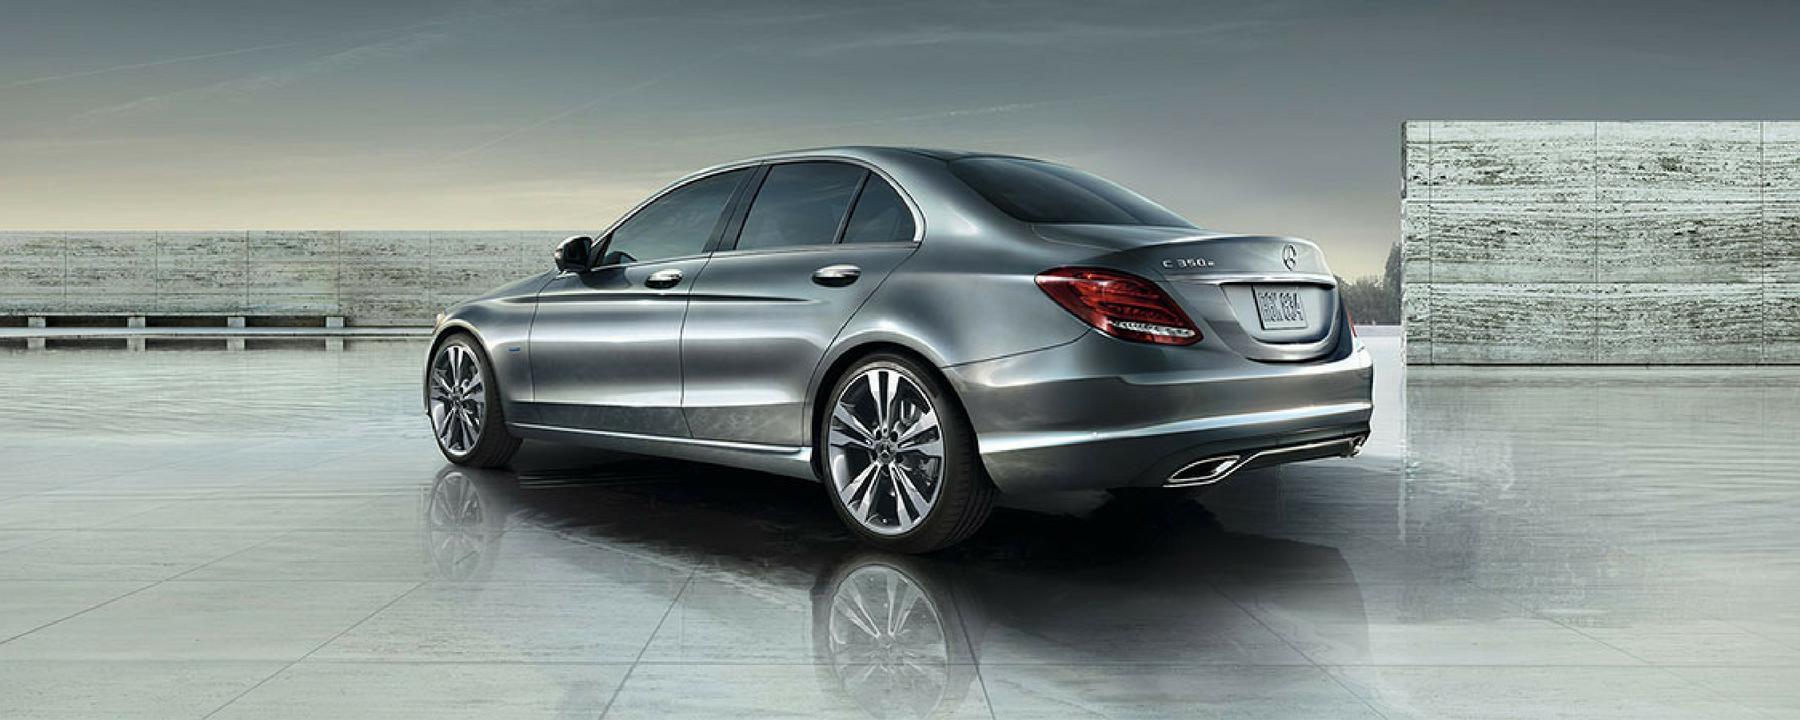 2018_MercedesBenz_CClass_Sedan